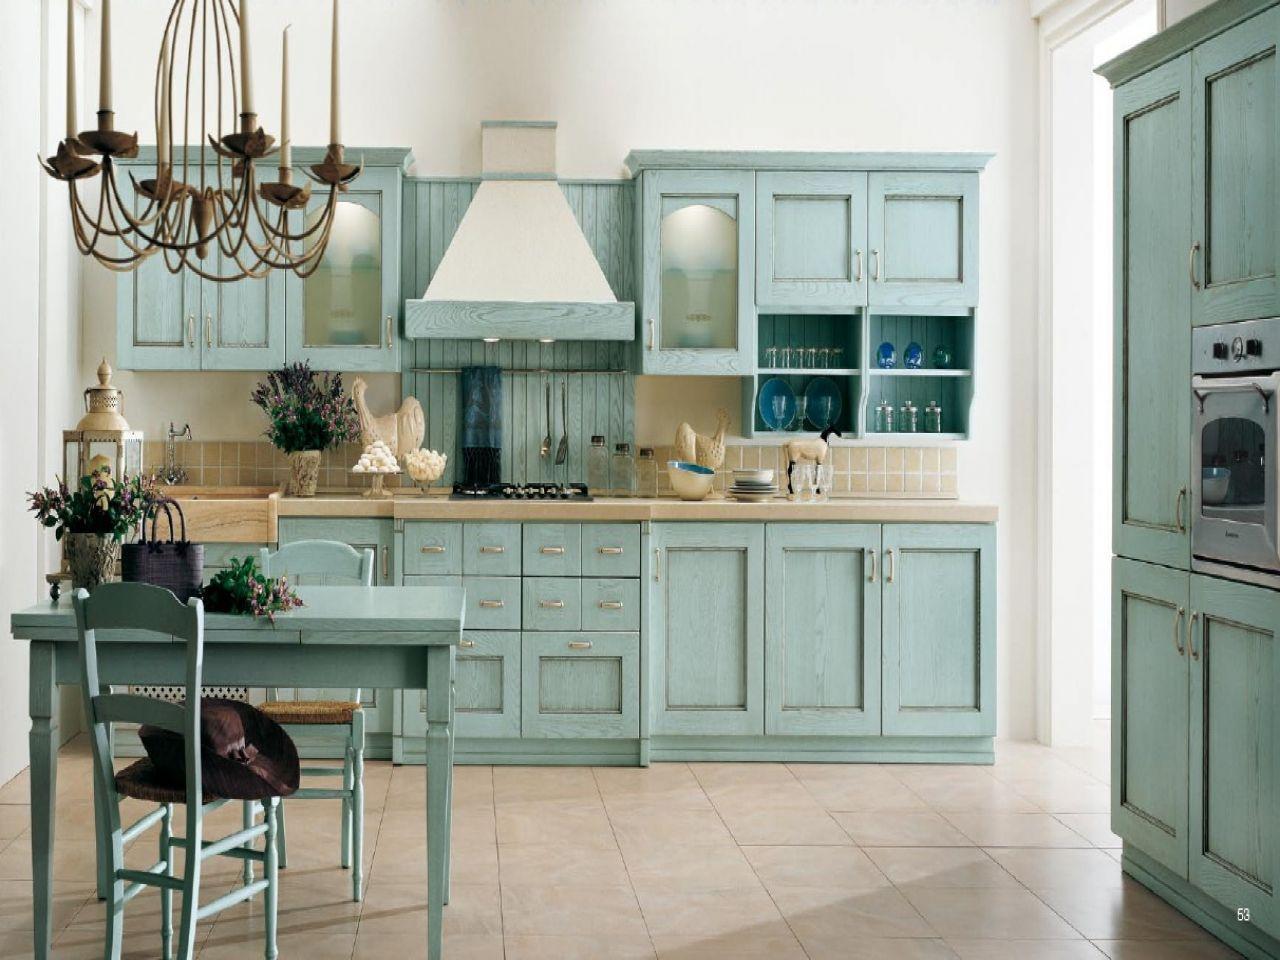 annie-sloan-duck-egg-blue-duck-egg-blue-kitchen-cabinets ...